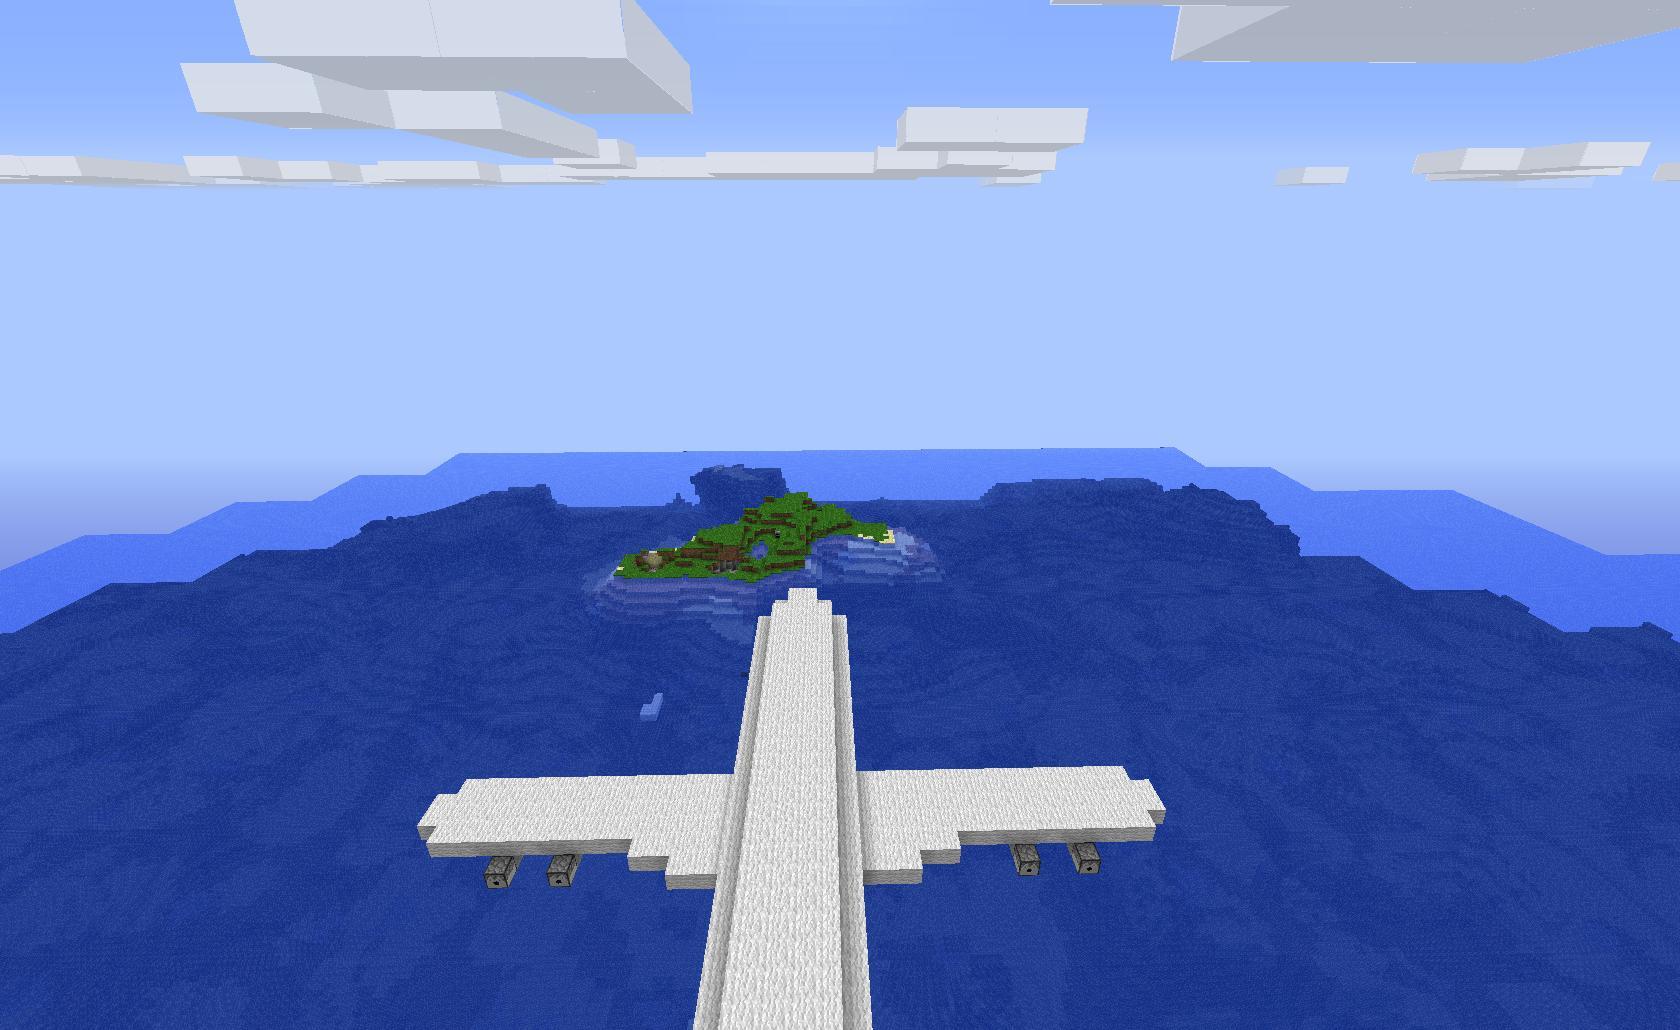 https://img.9minecraft.net/Map/The-Crash-Map-2.jpg